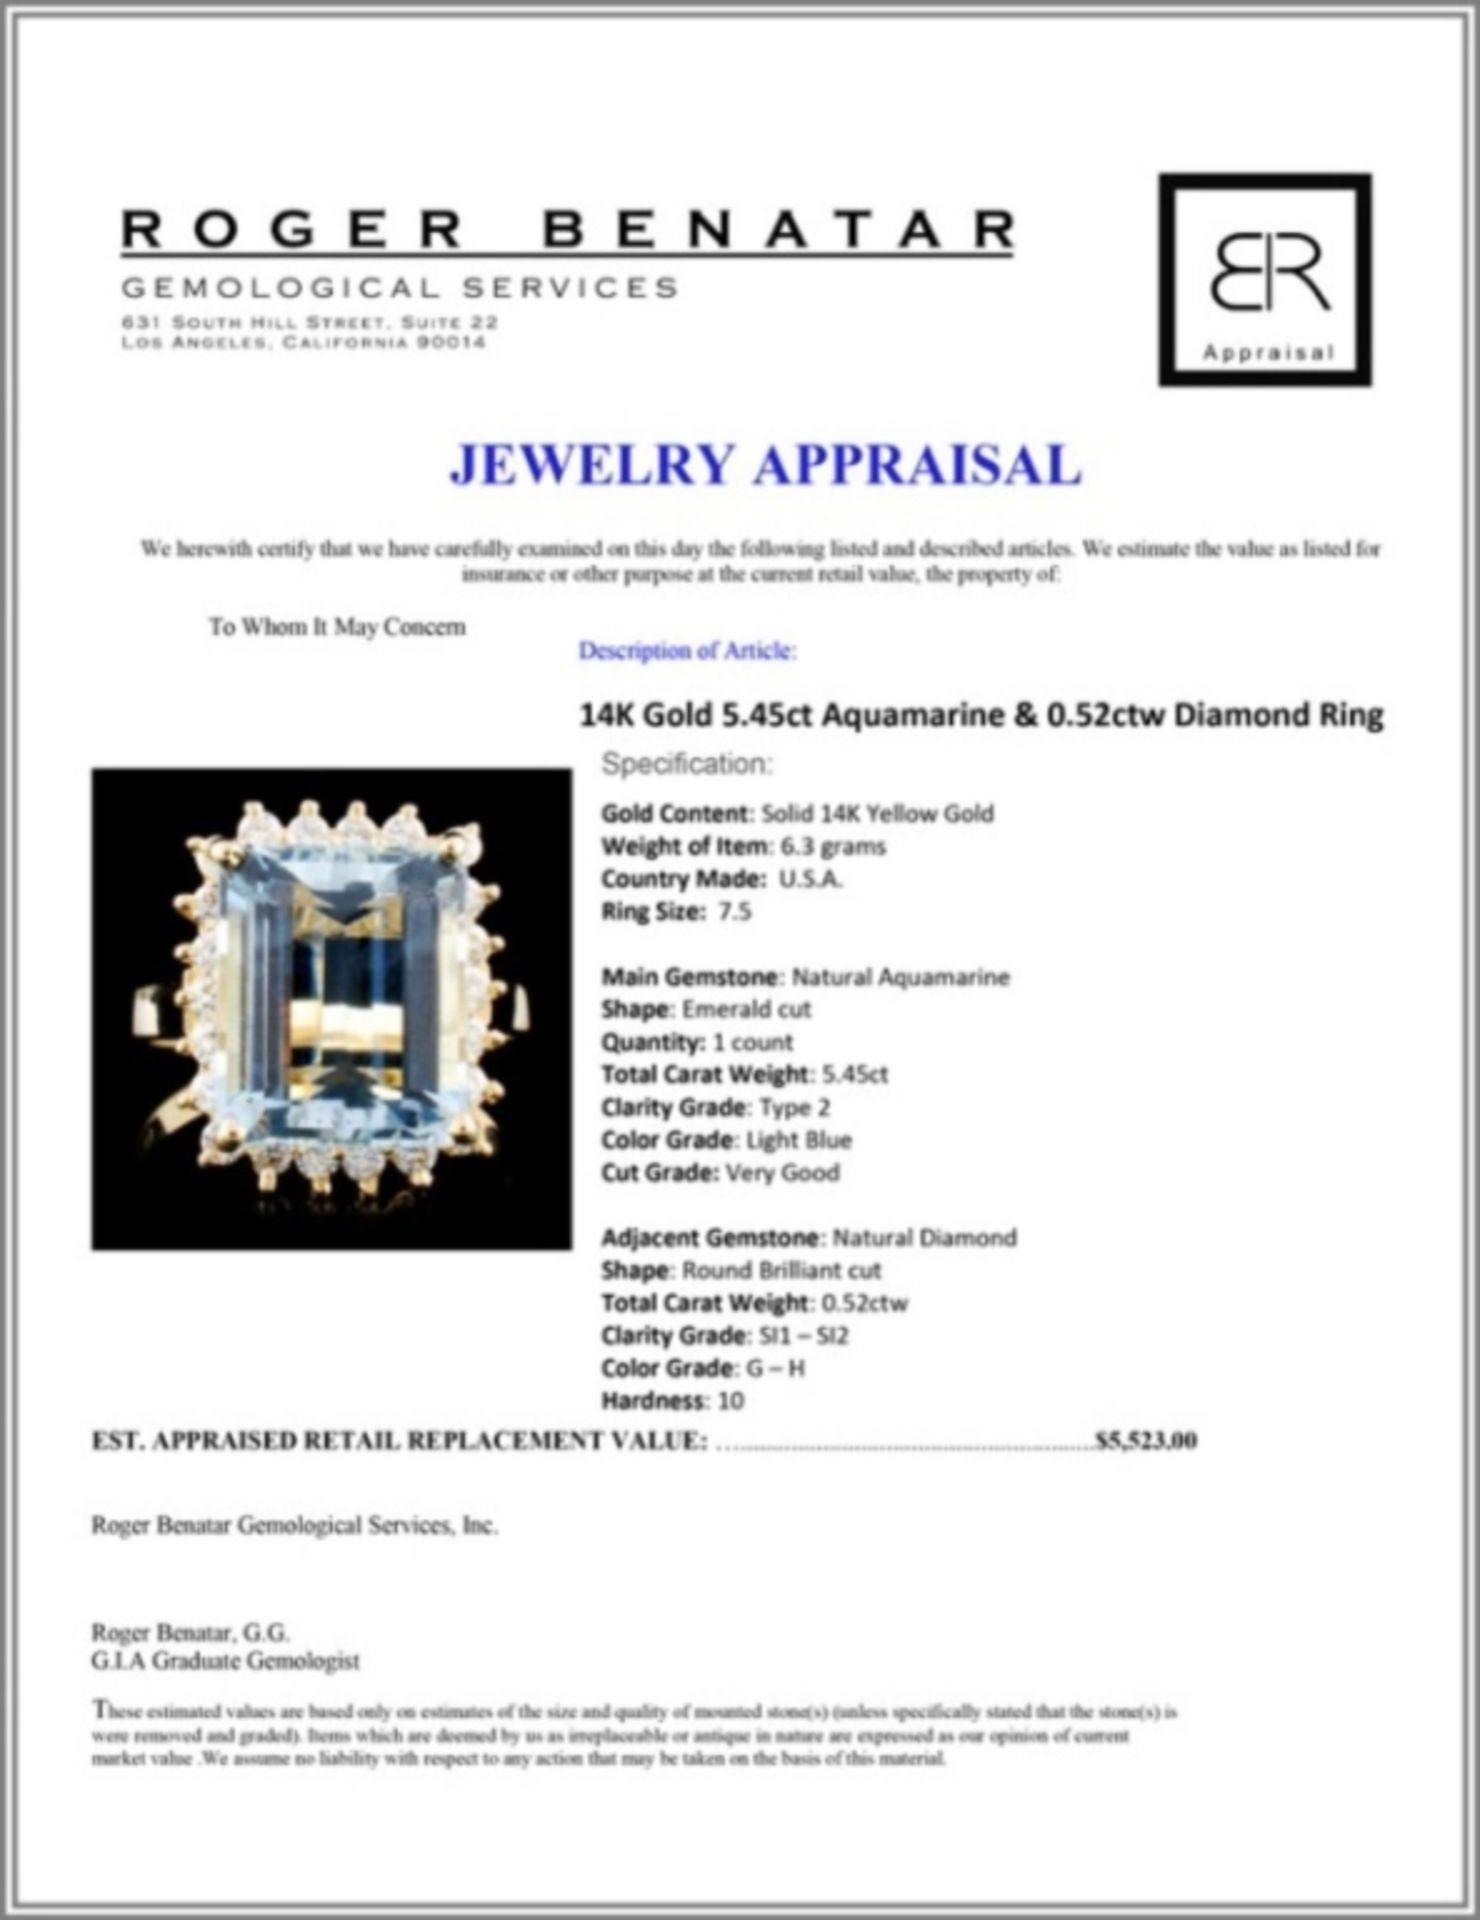 14K Gold 5.45ct Aquamarine & 0.52ctw Diamond Ring - Image 4 of 4